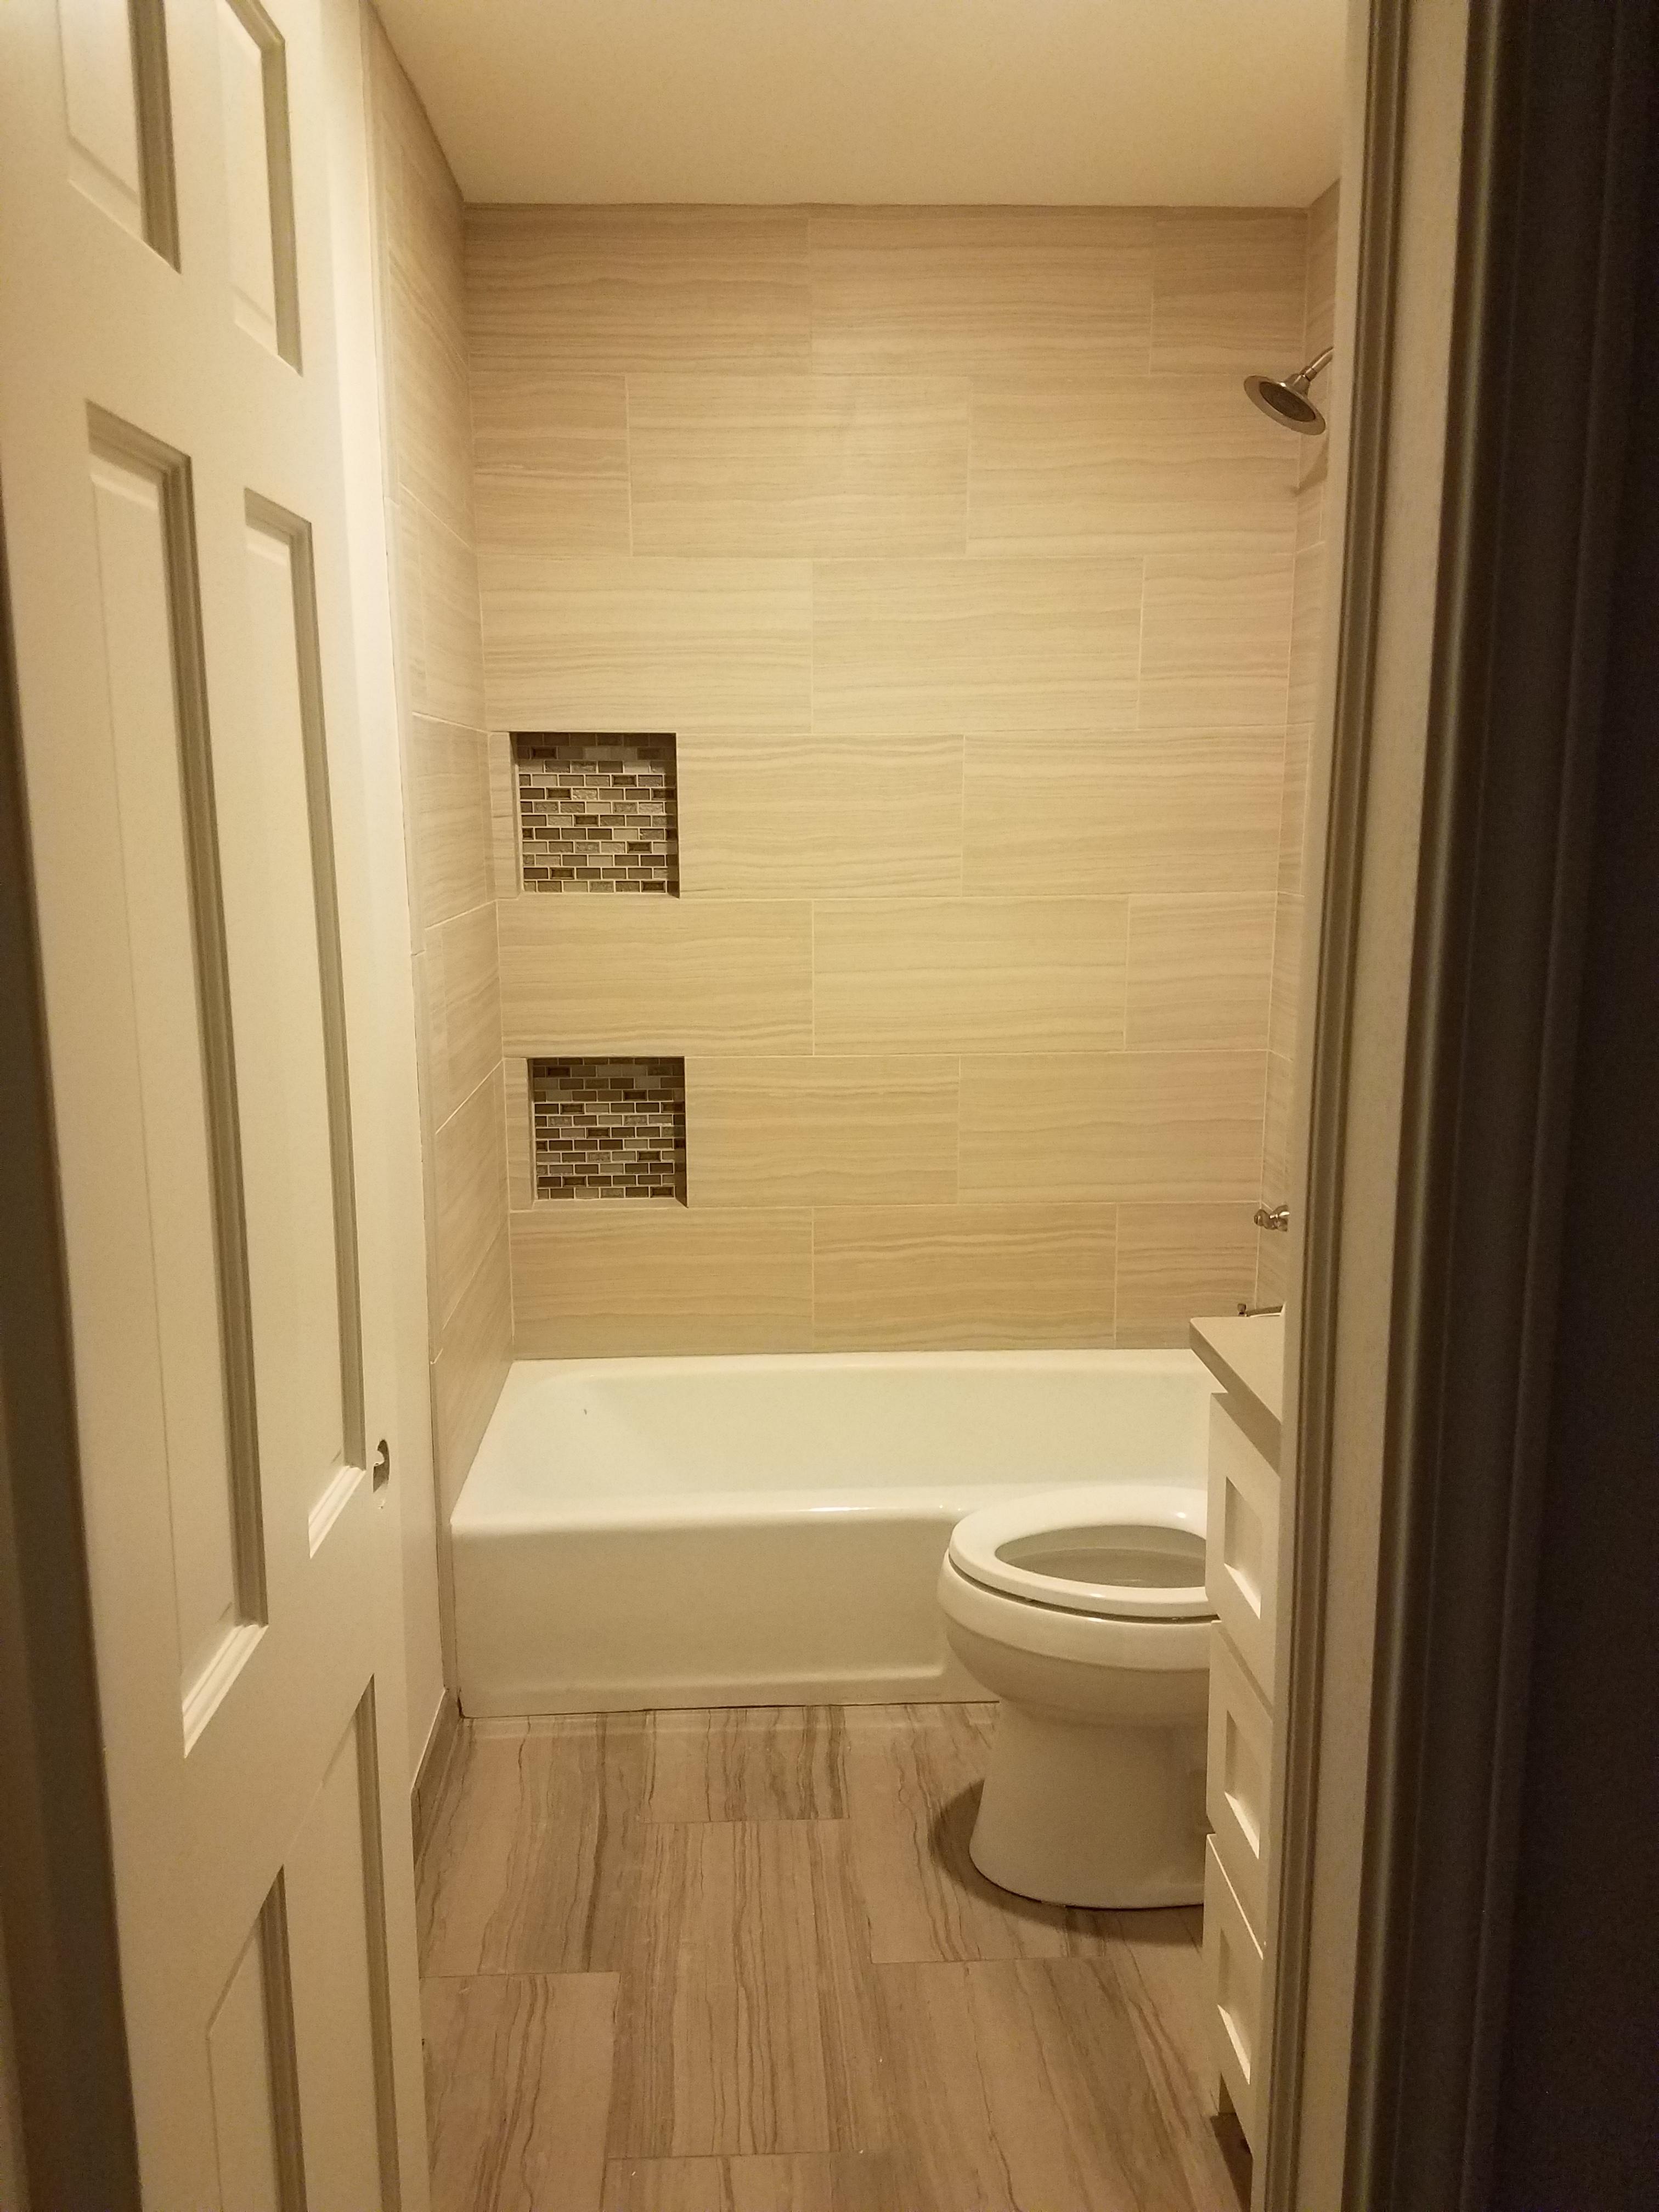 rolston bath 5